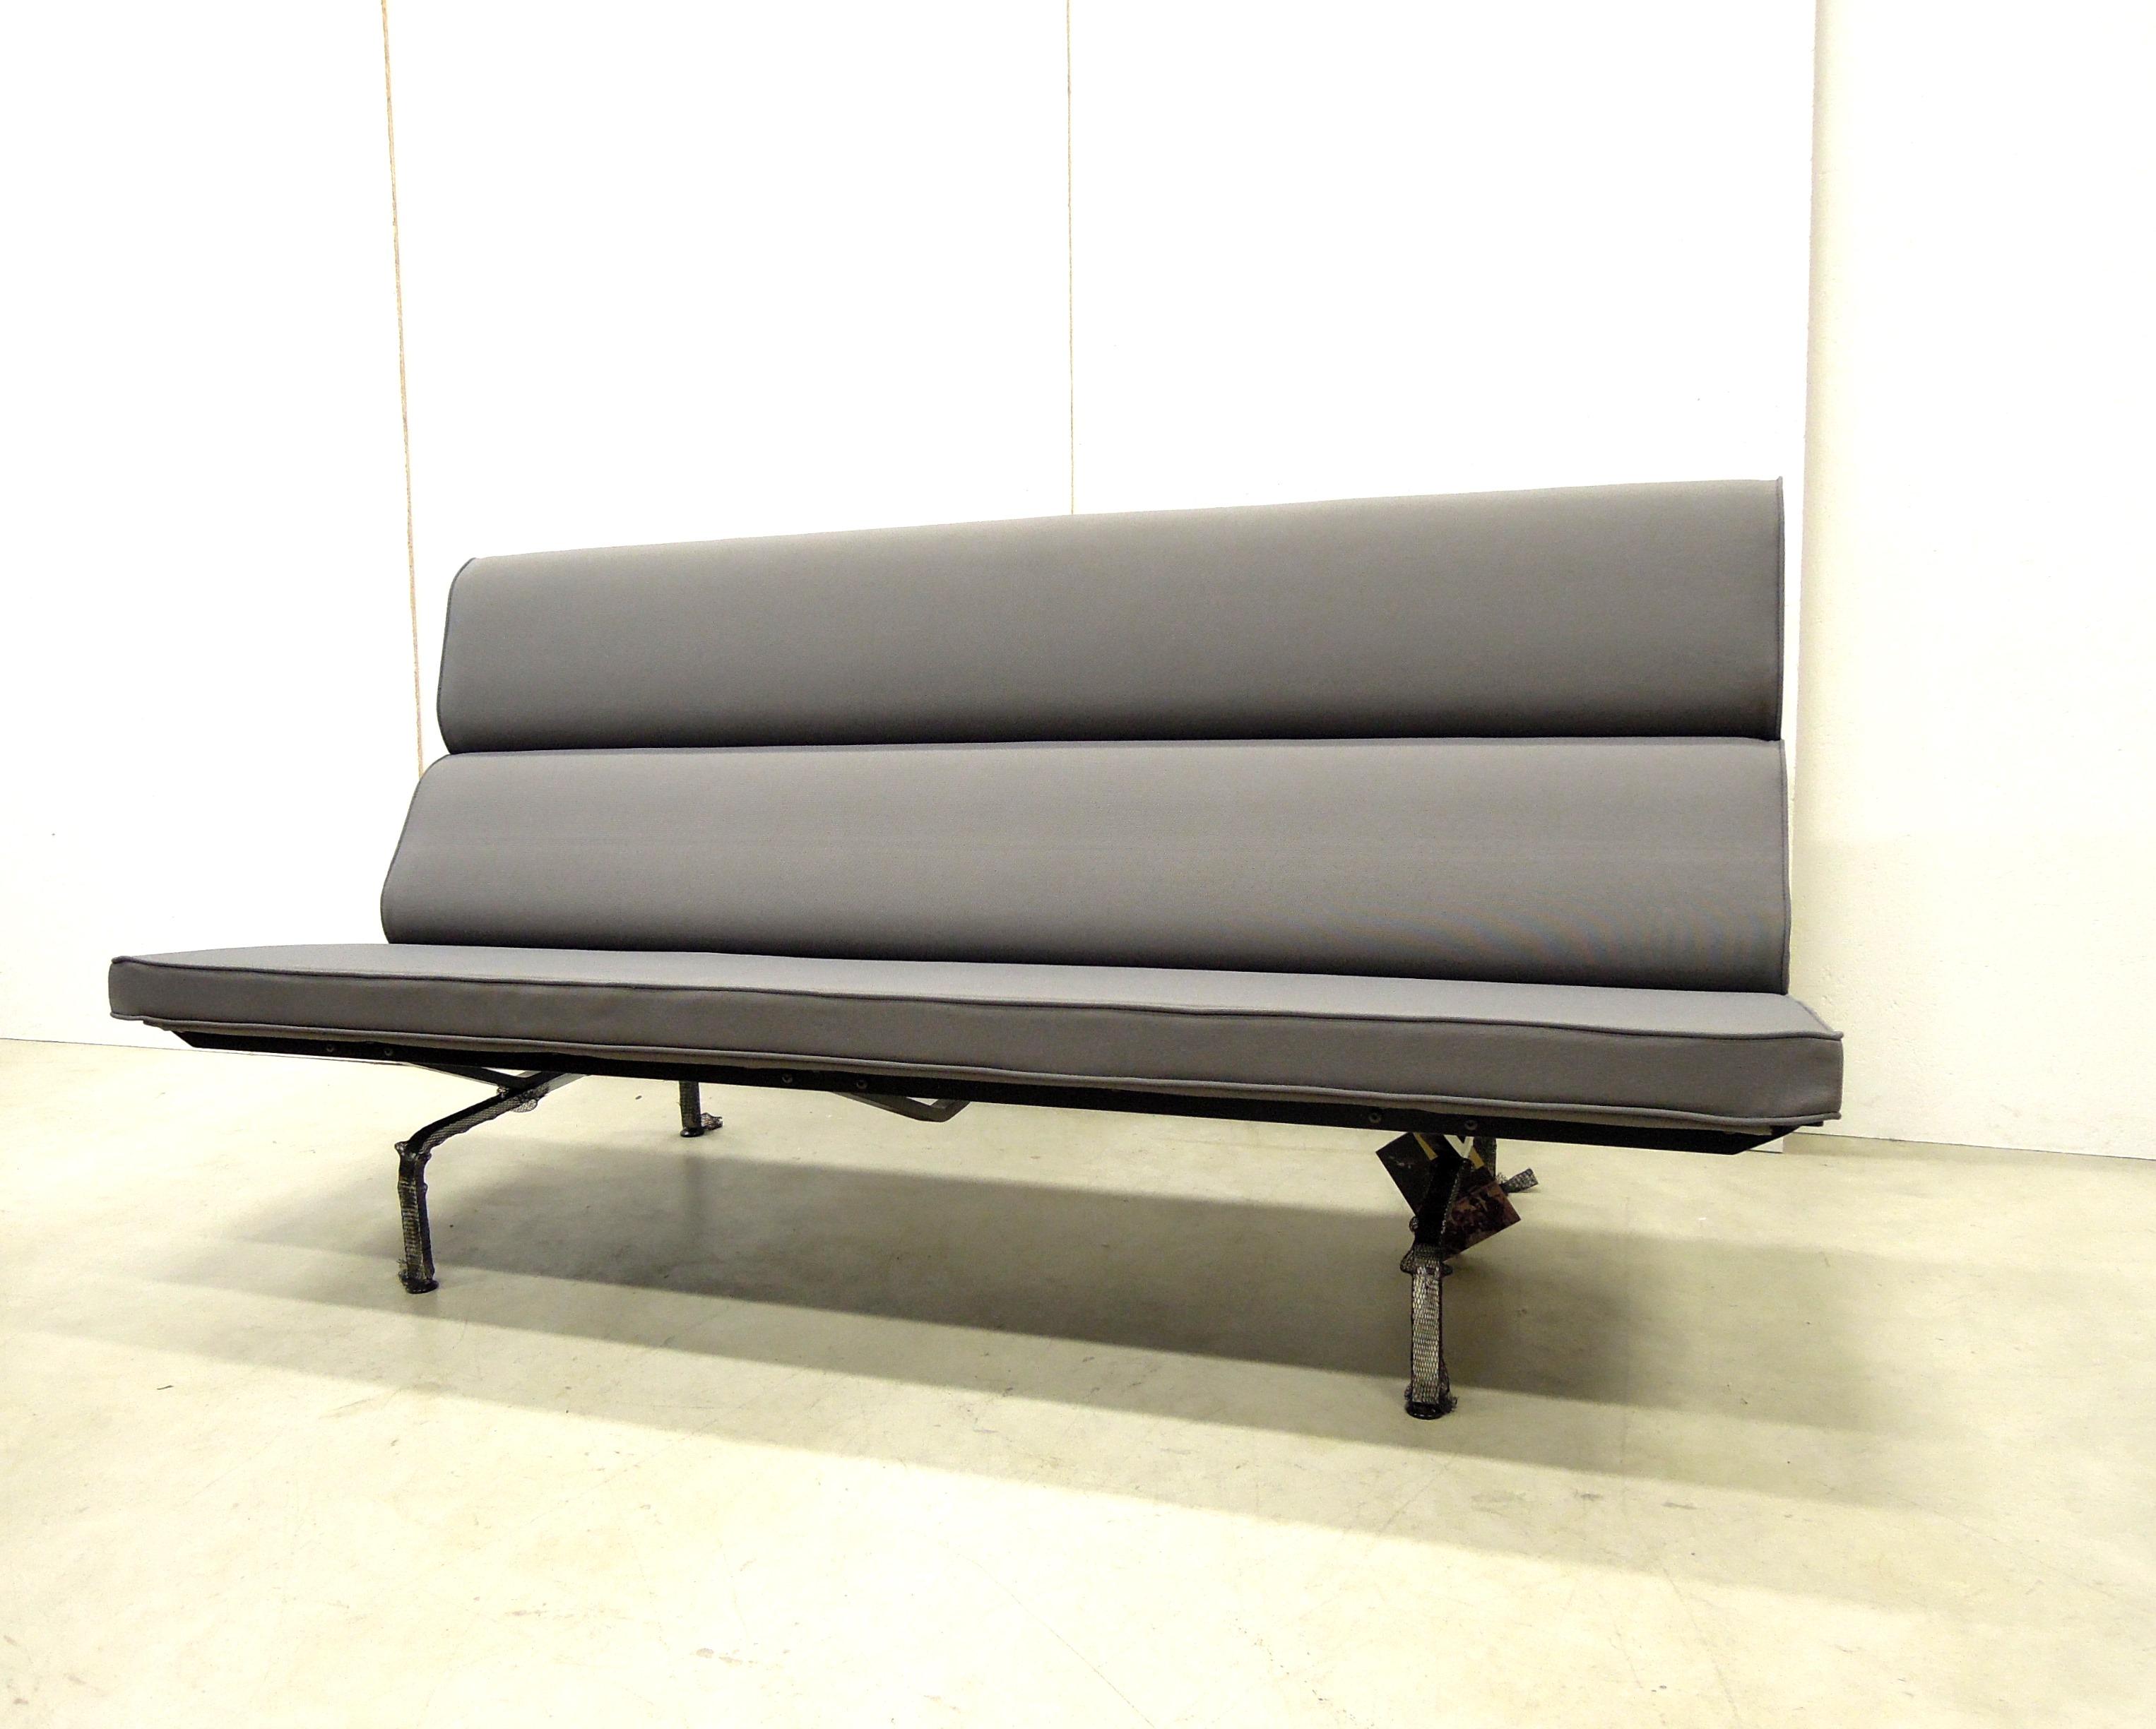 Vitra Chalres Eames : Vitra compact sofa by charles eames interior aksel